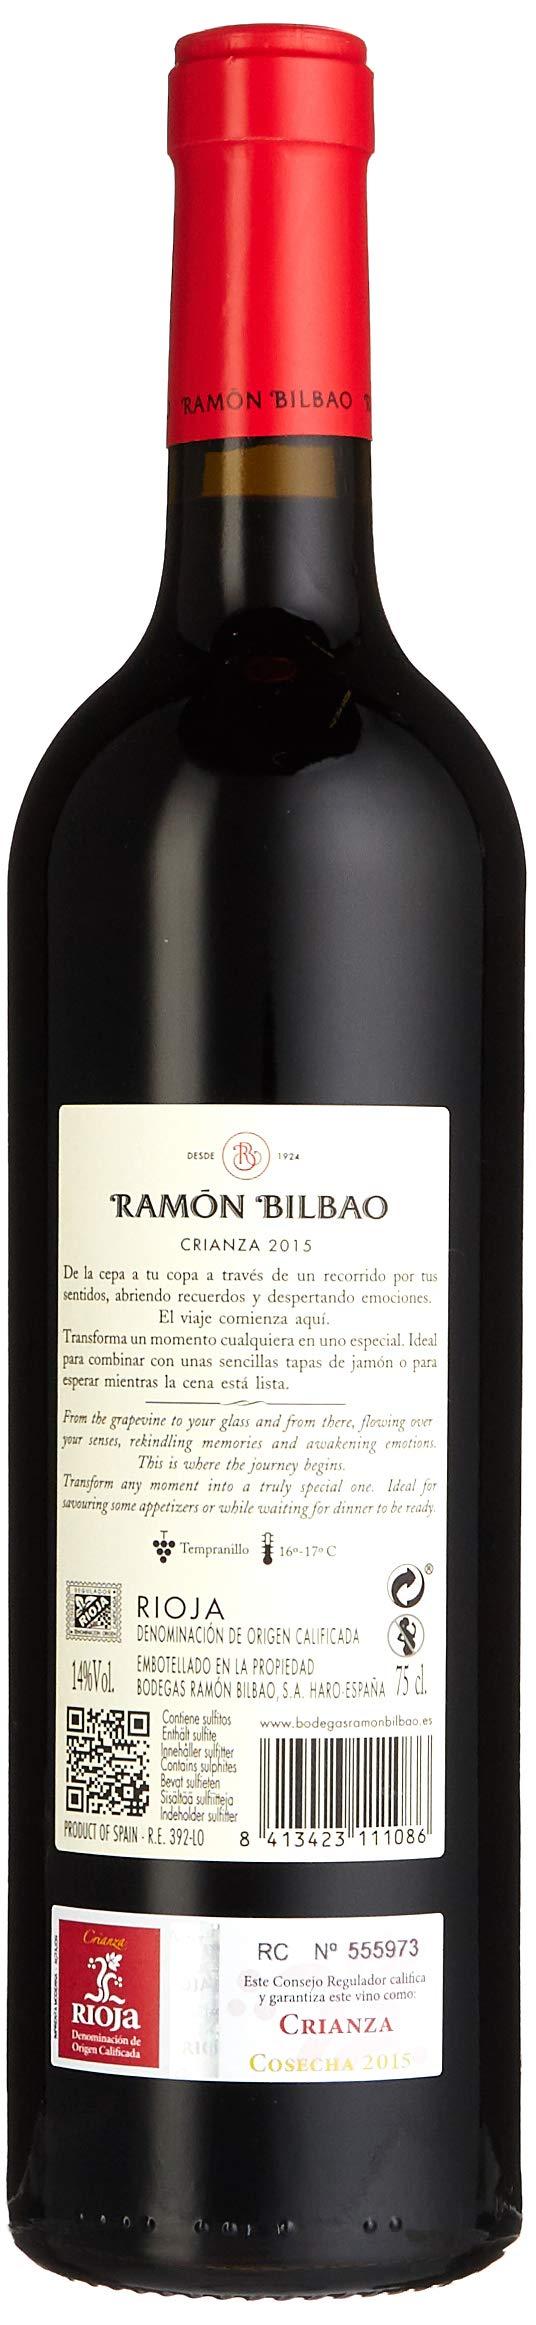 RAMON-BILBAO-Bodegas-Rioja-Crianza-DOCA-Tempranillo-2014-Trocken-6-x-075-l